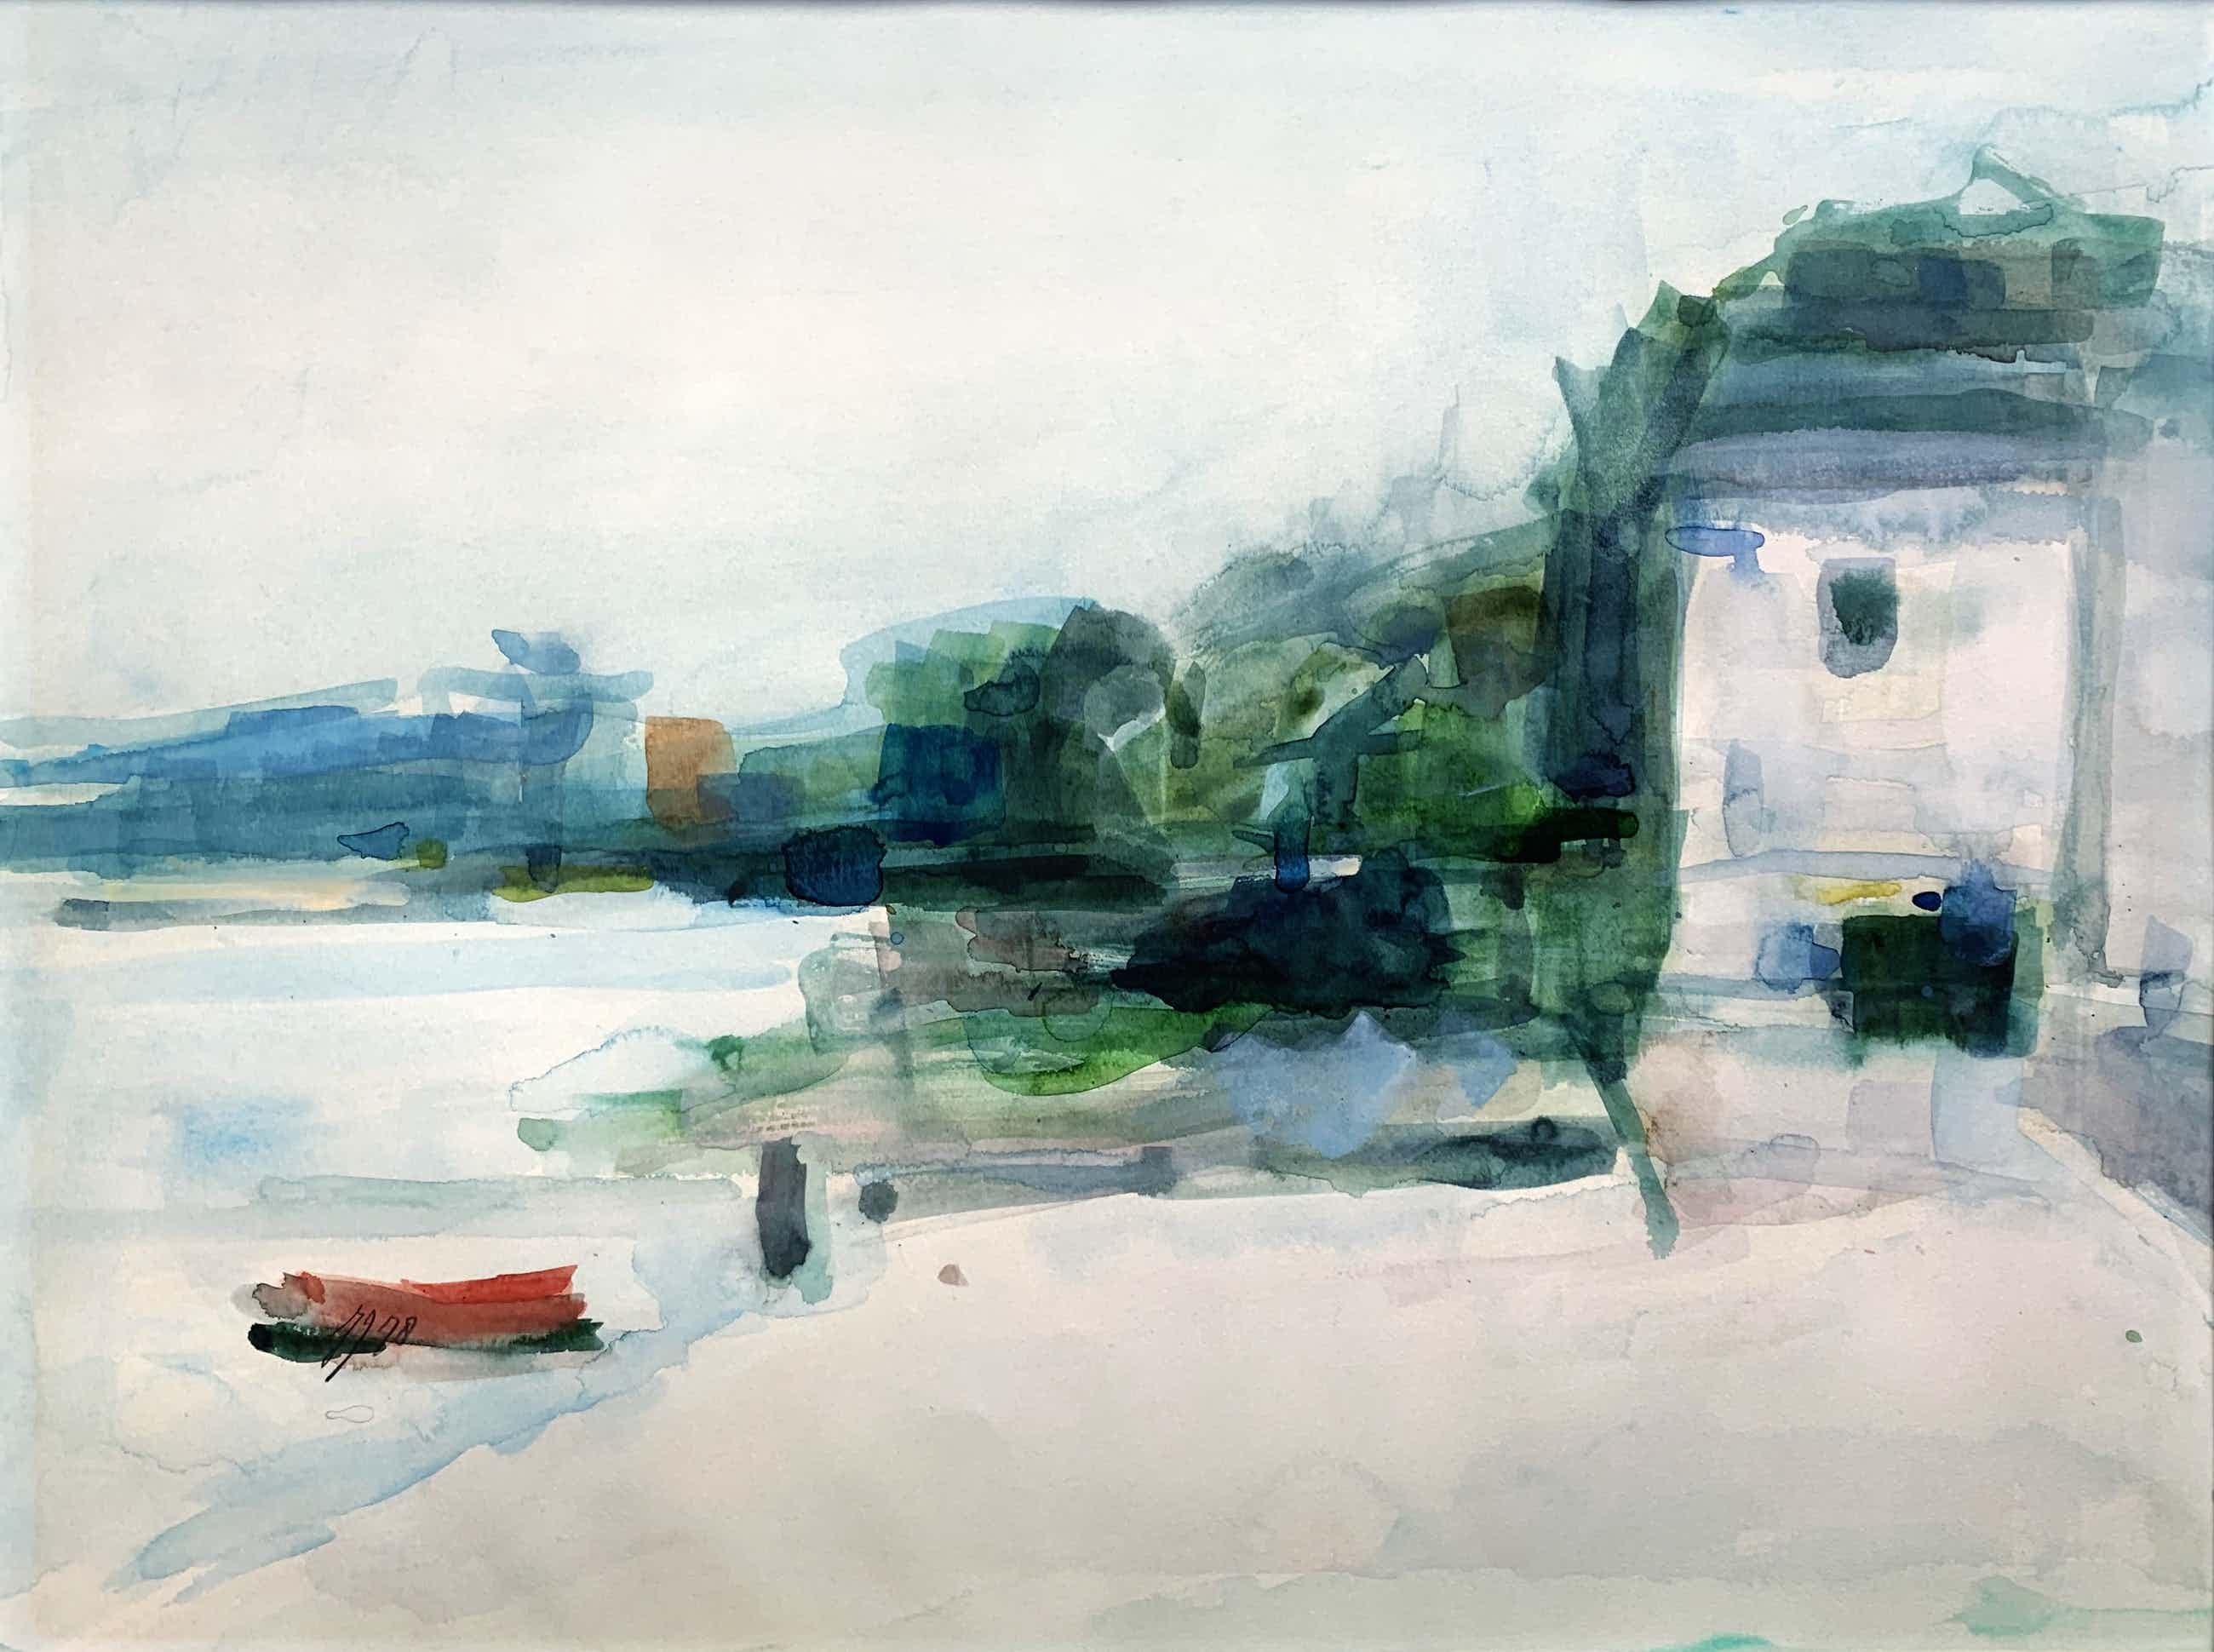 Hans Hellingwerf - aquarel | 'Huis aan de rivier' | 1978 (Uniek werk) kopen? Bied vanaf 60!